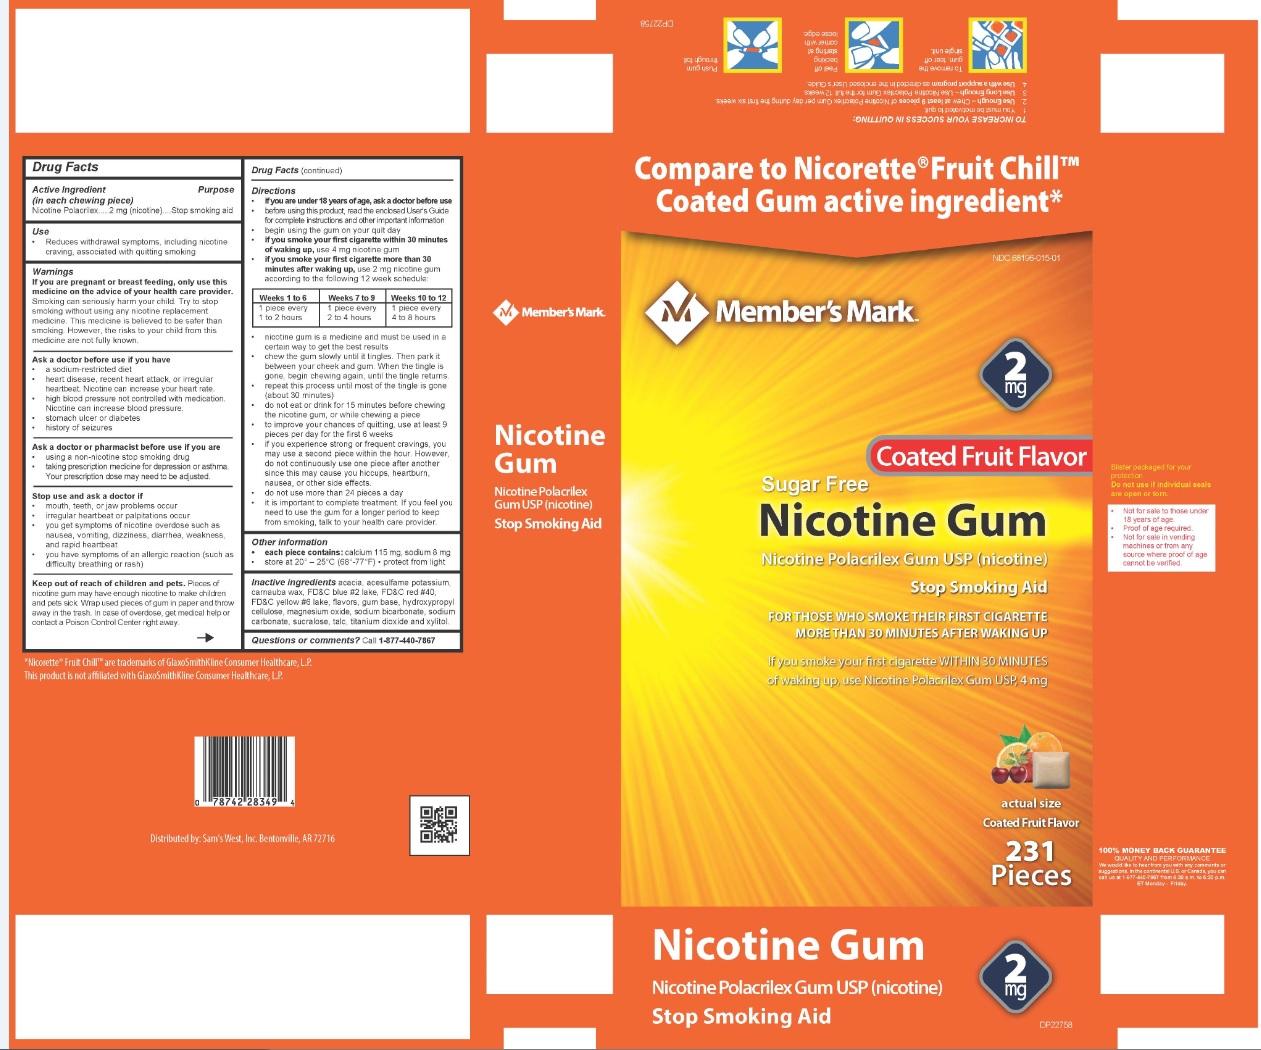 Nicotine Polacrilex Gum USP 2 mg Fruit Flavor